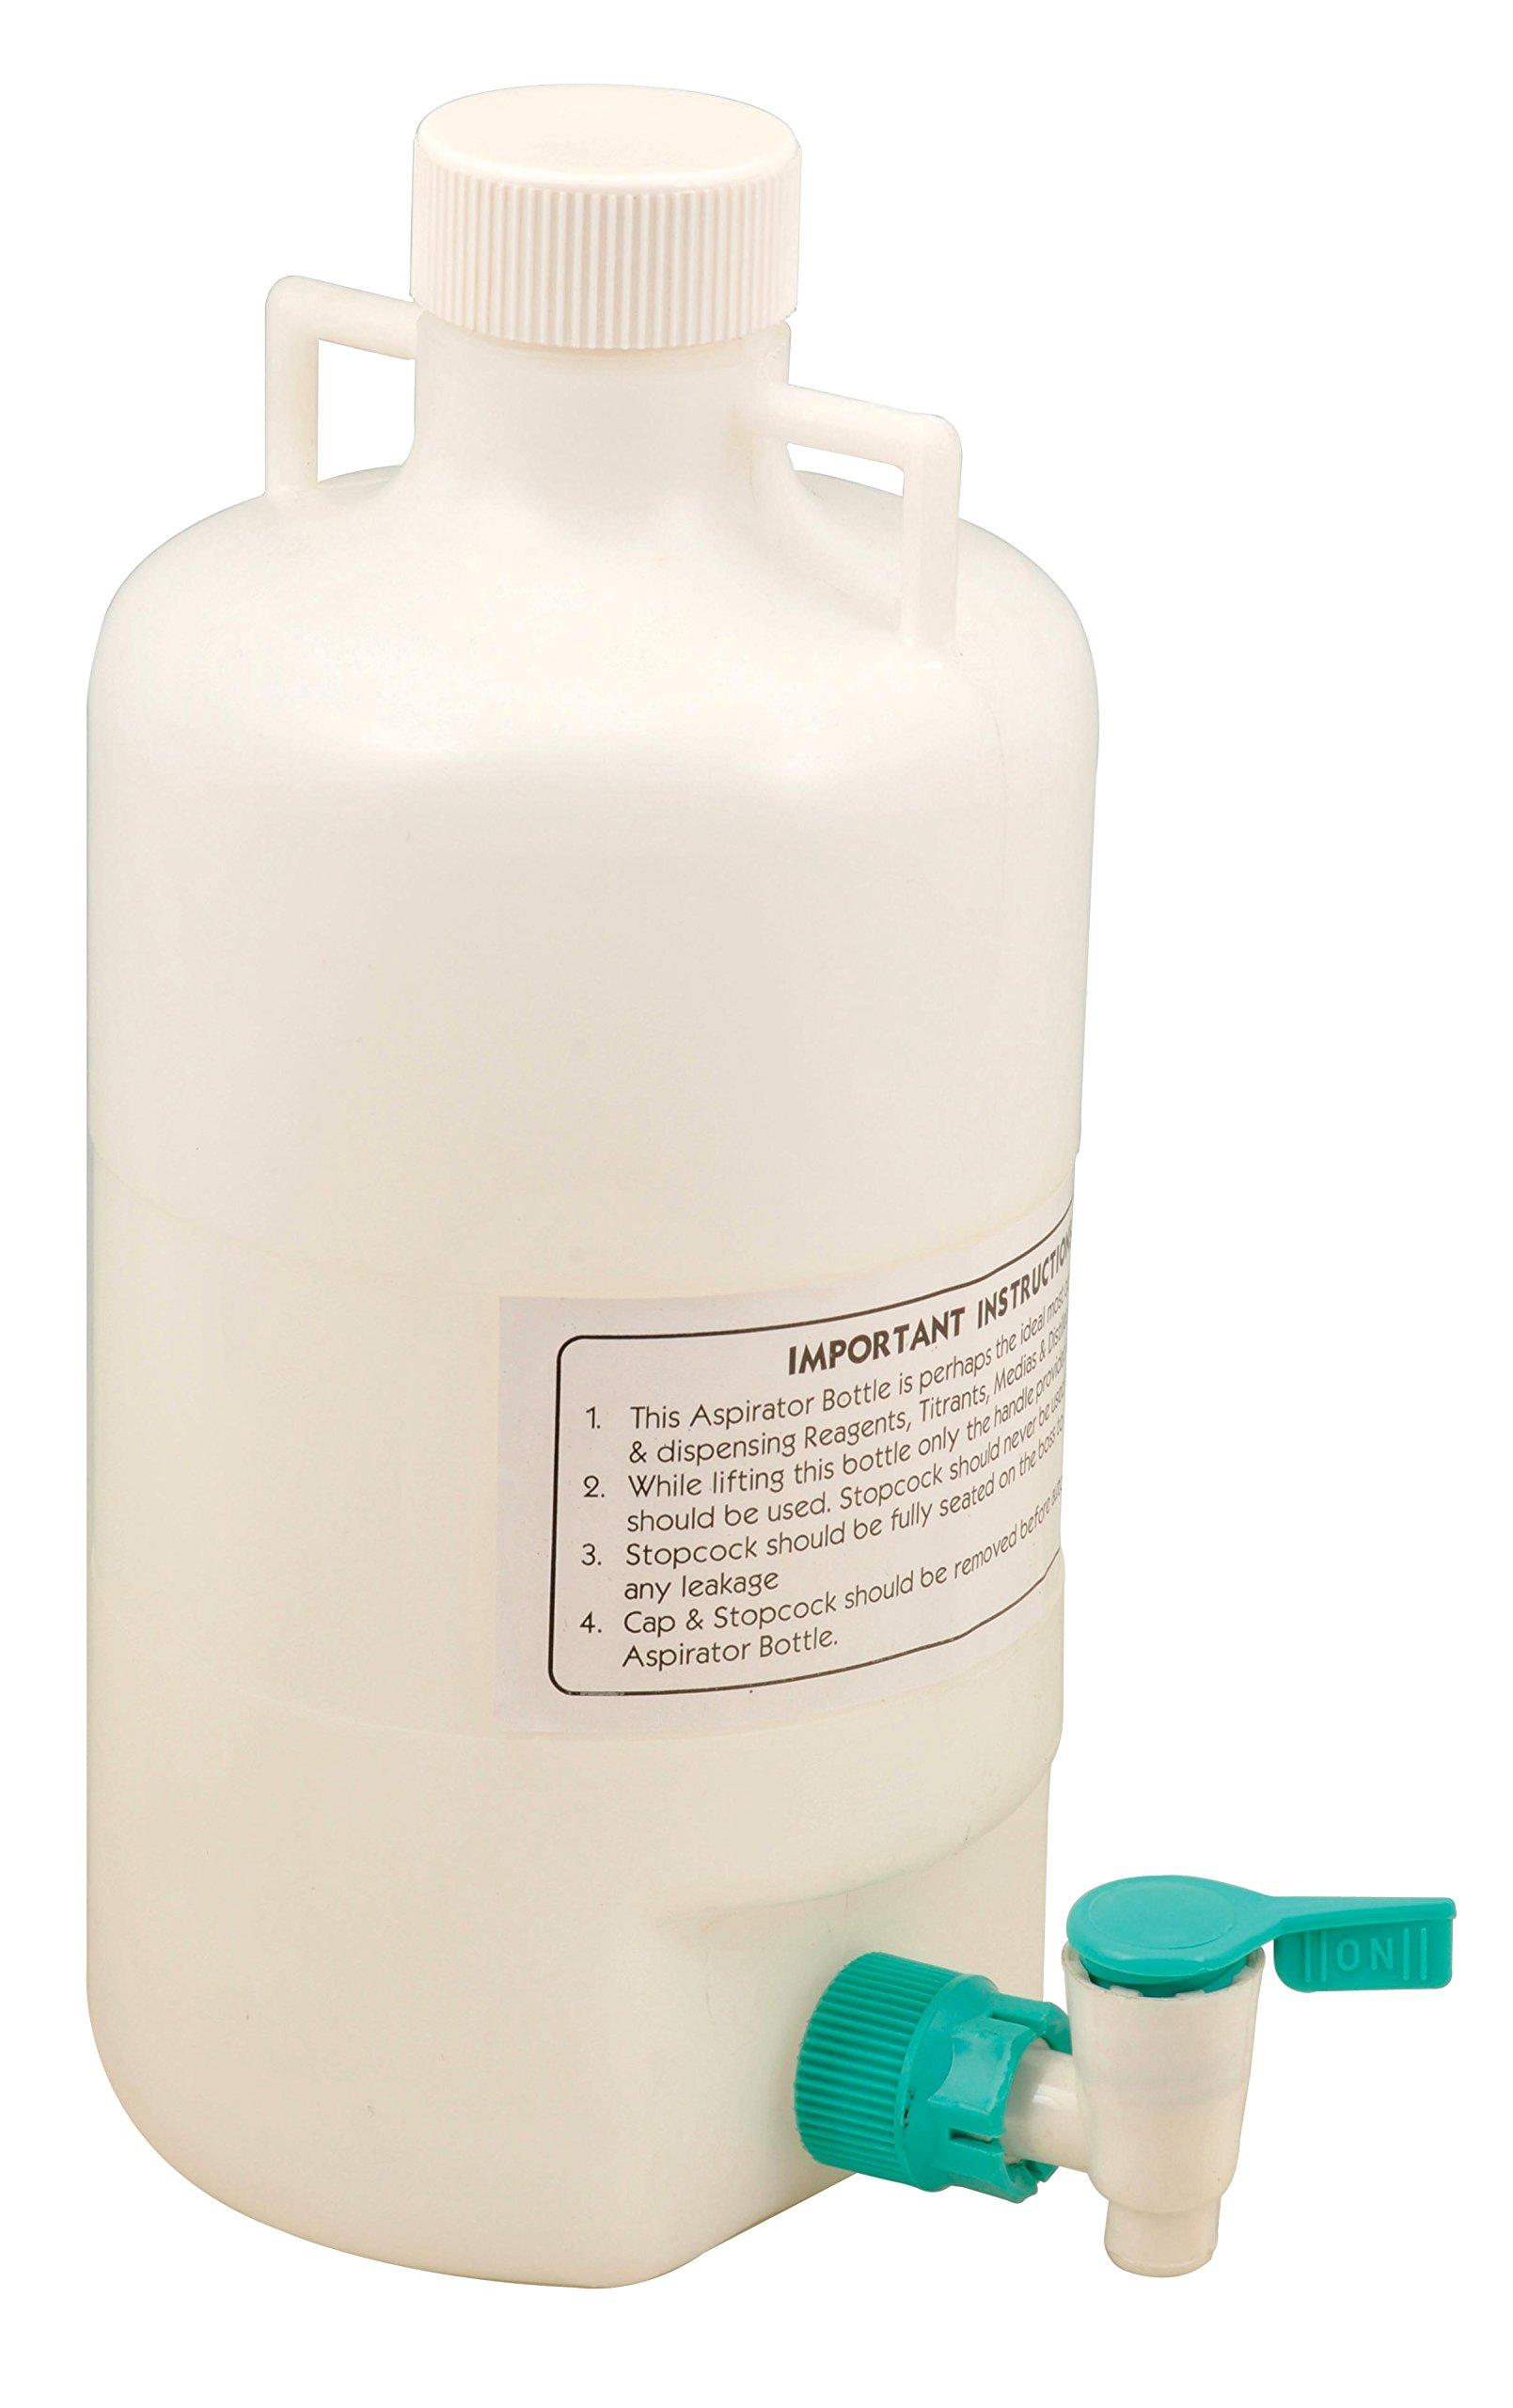 5 Liter Polypropylene Aspirator Bottle with Leak Proof Spigot - Eisco Labs